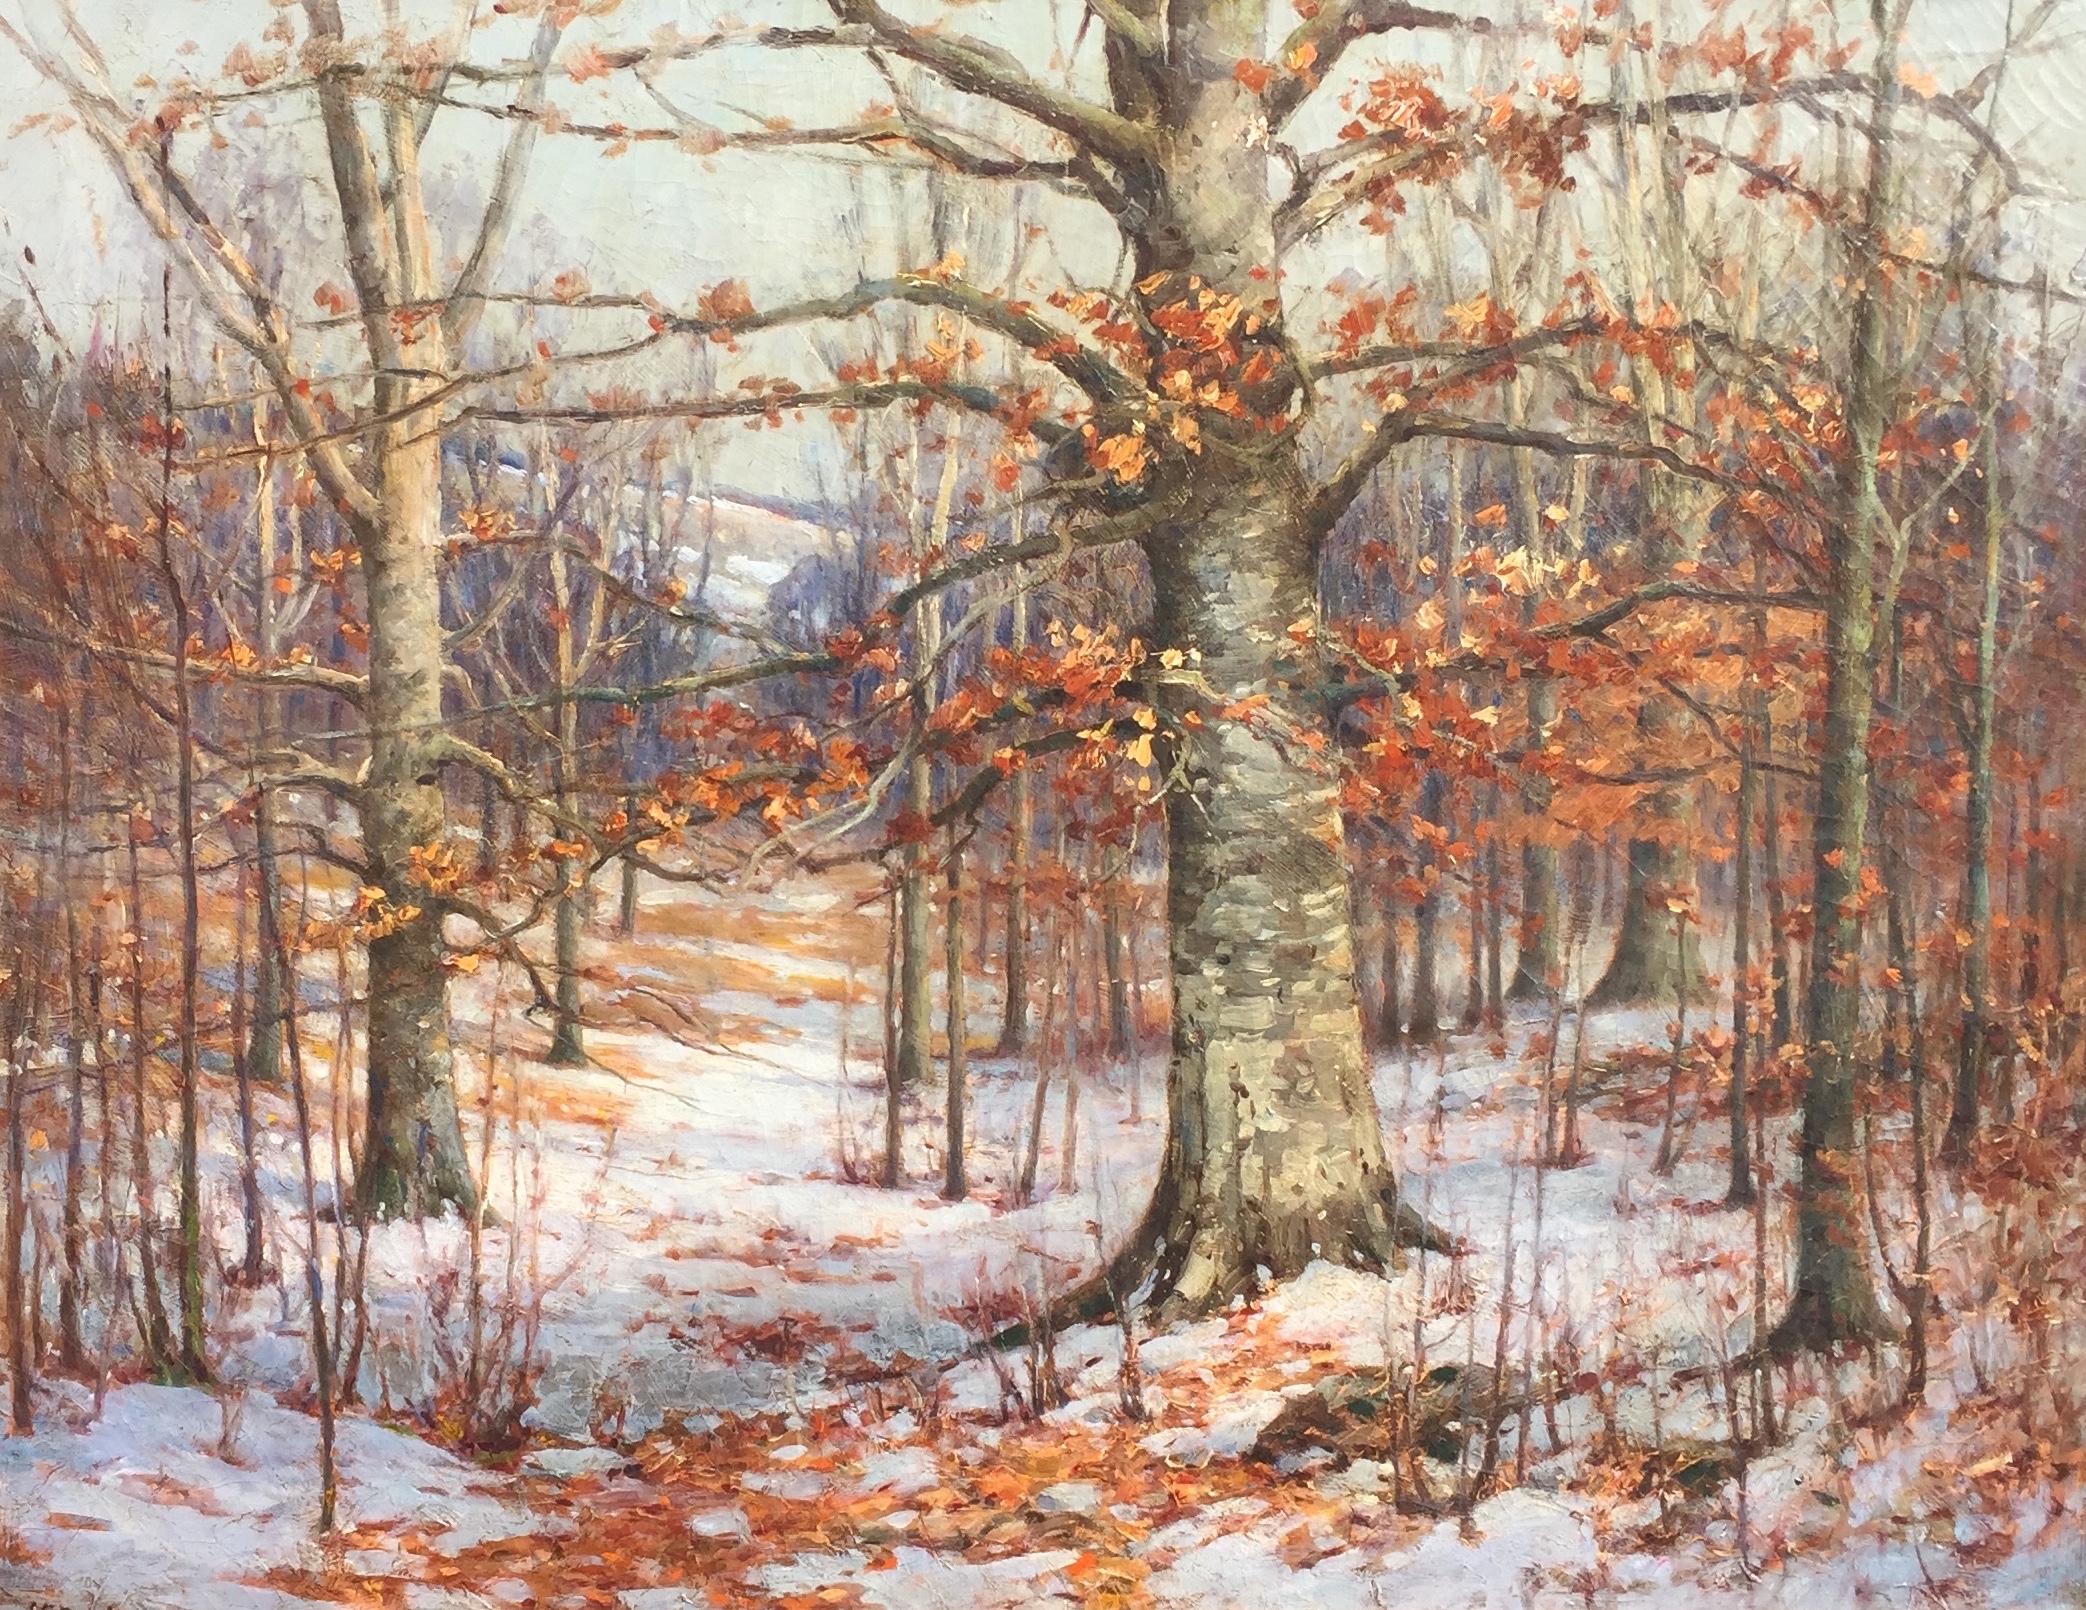 bundy-winter-2836-cropped